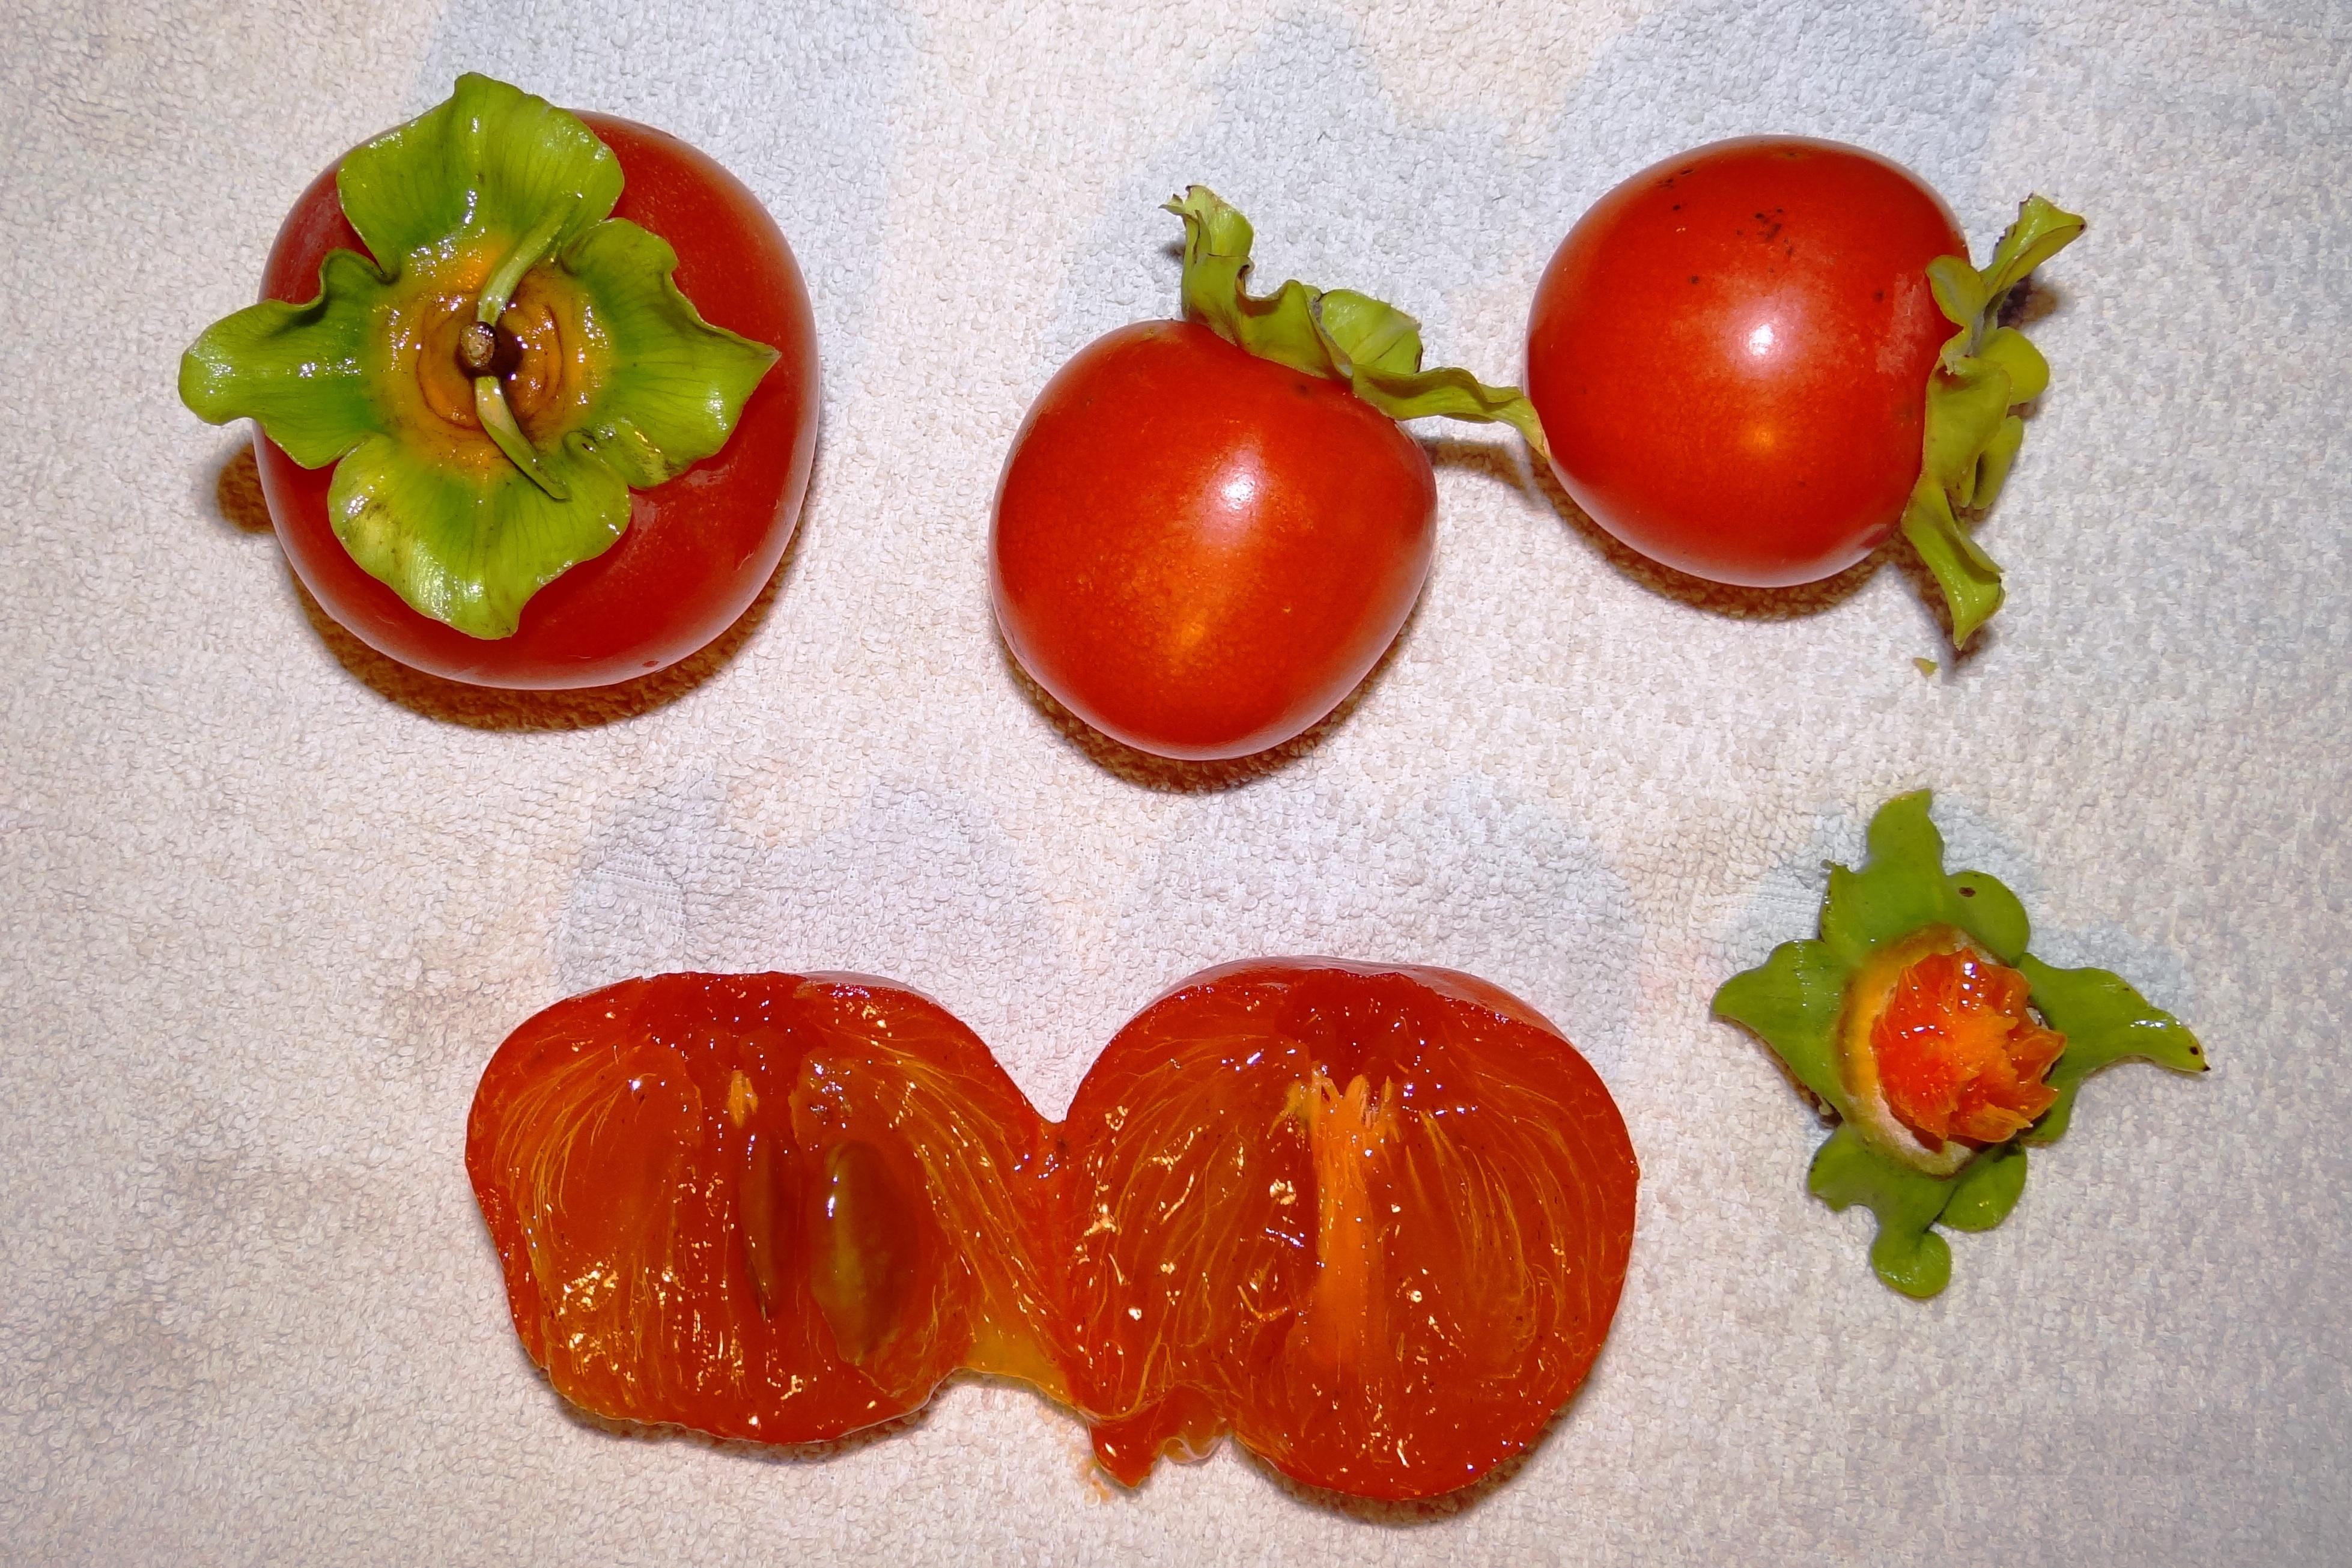 Diospyros kaki Seeds. Japanese Persimmon Sharon Fruit